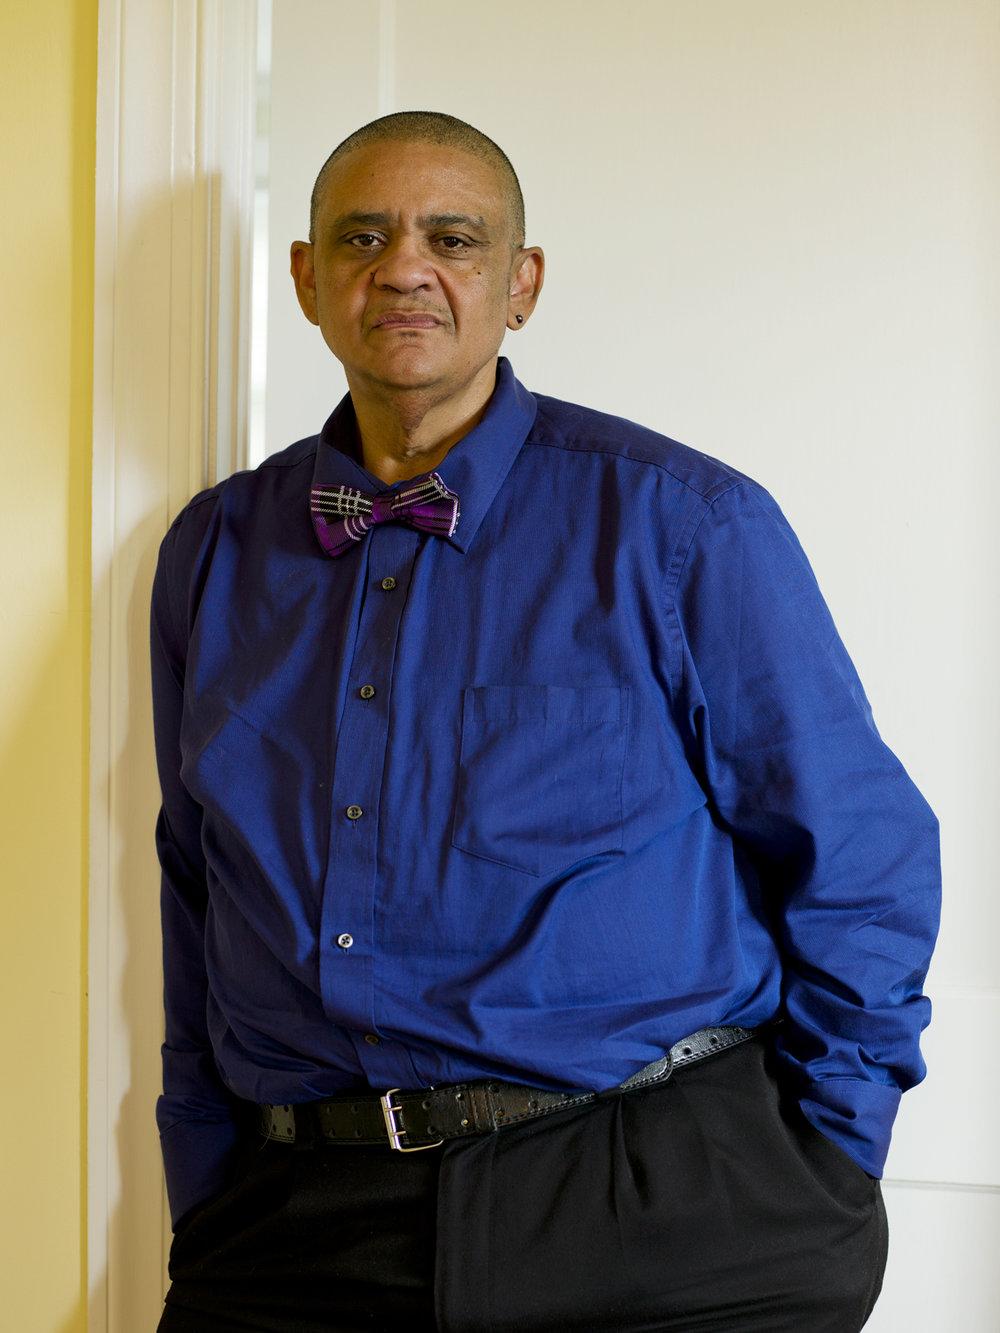 Charley, 53, Charlottesville, VA, 2014